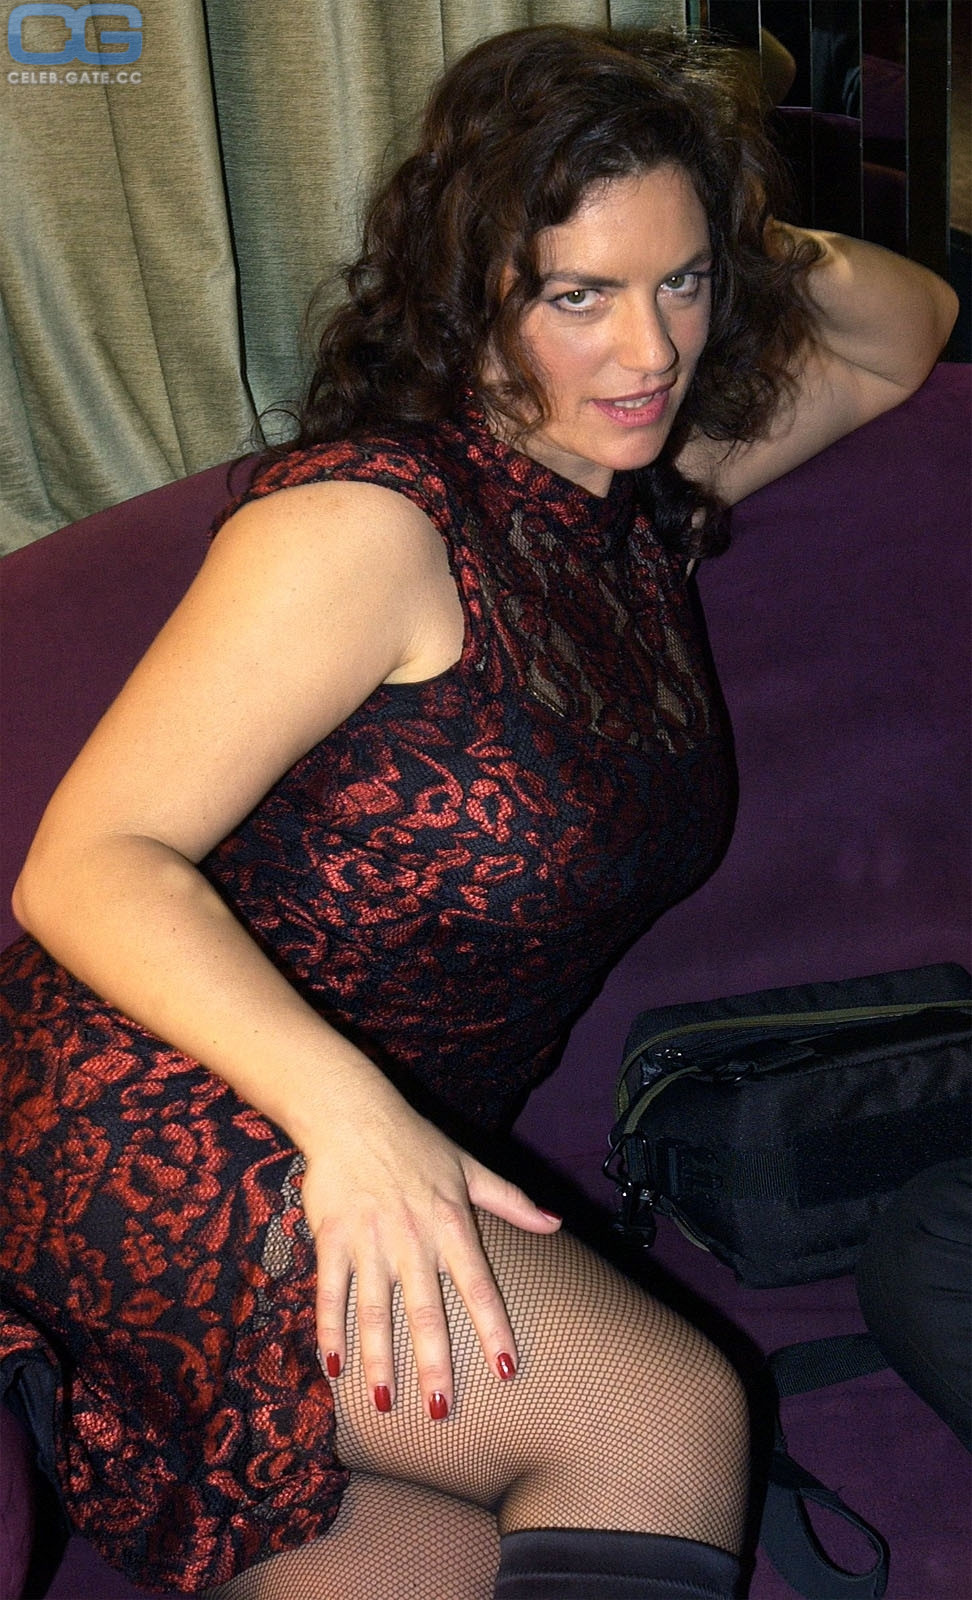 Christine nackt neubauer Nackt Fotos